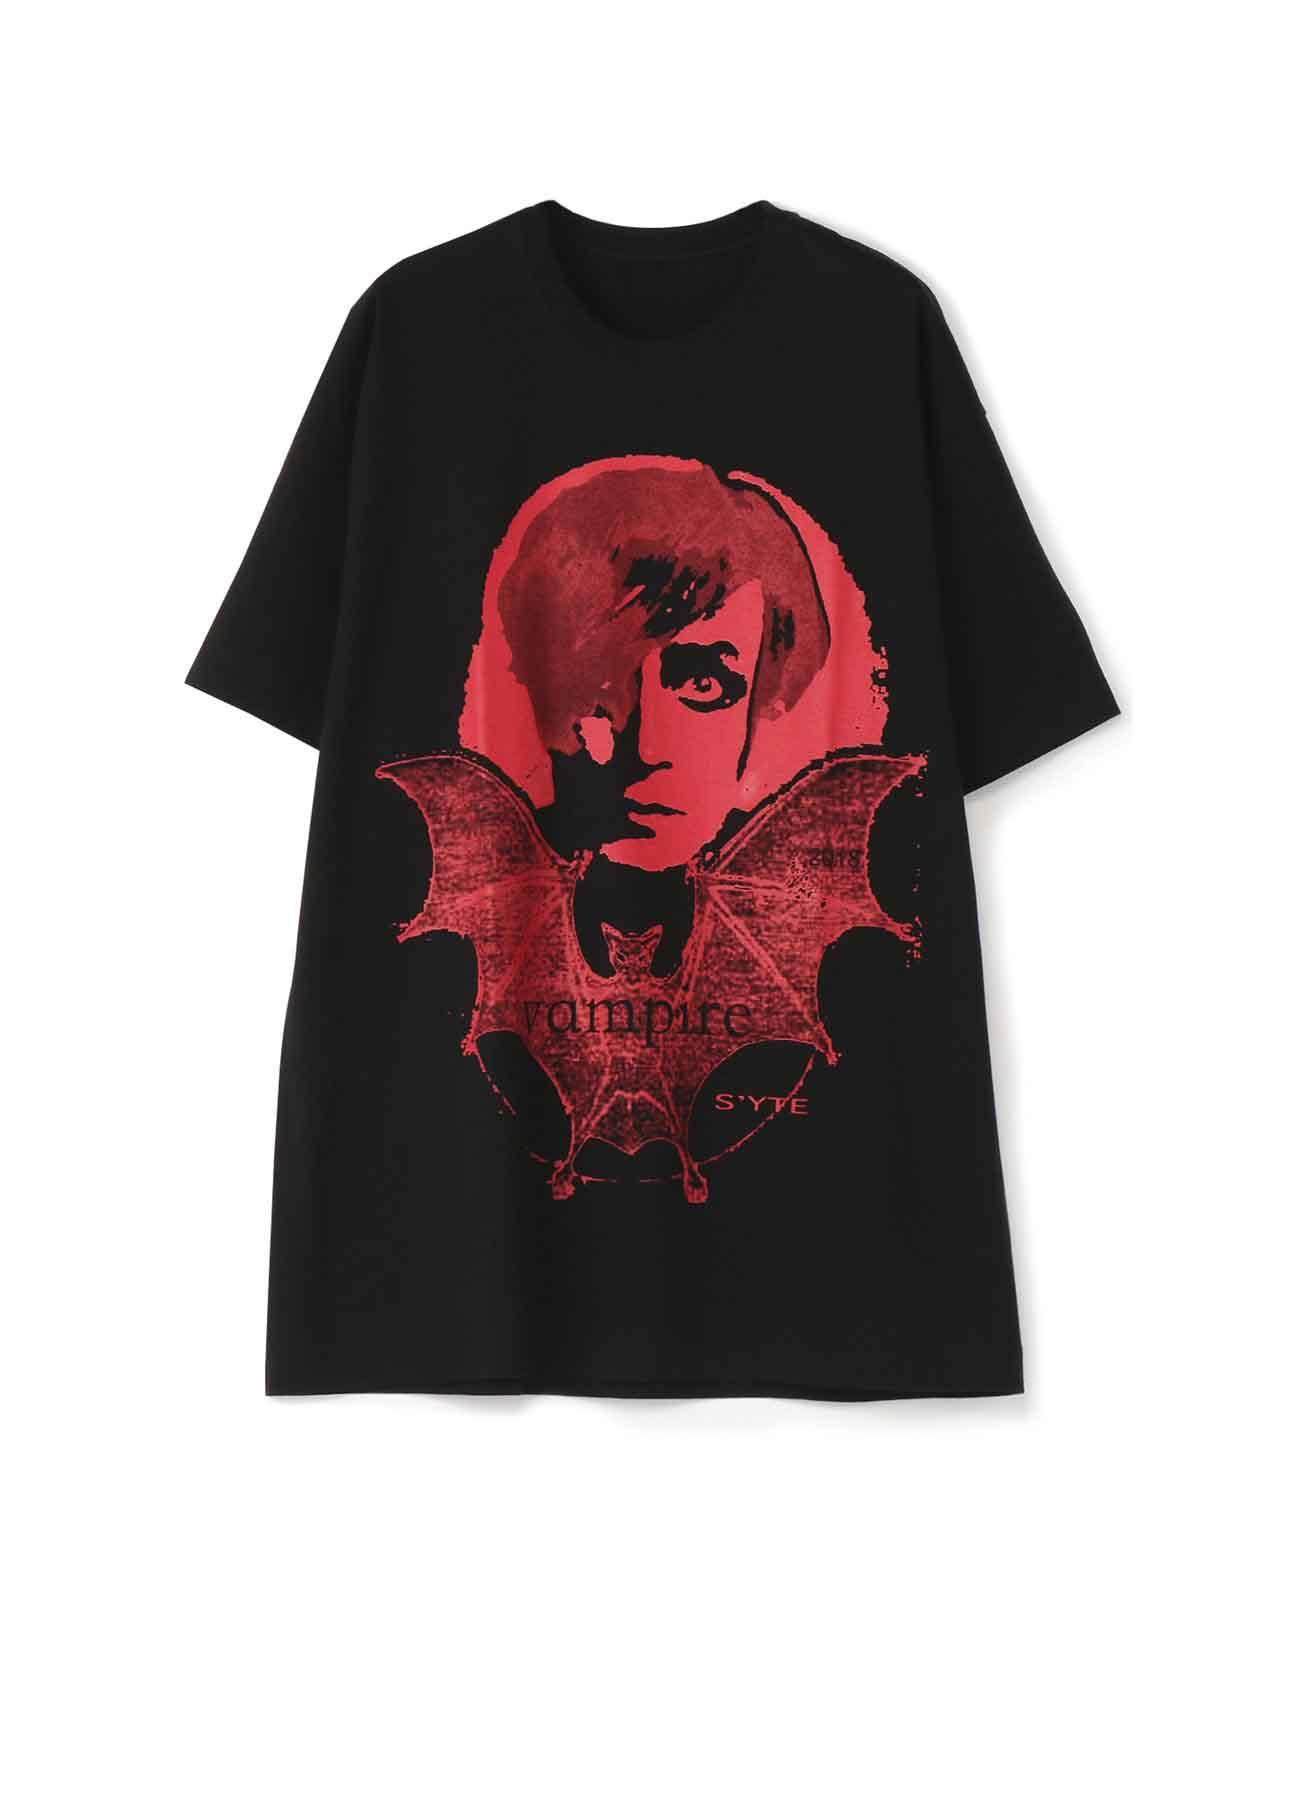 20/CottonJersey S'YTE Vampire T-Shirt